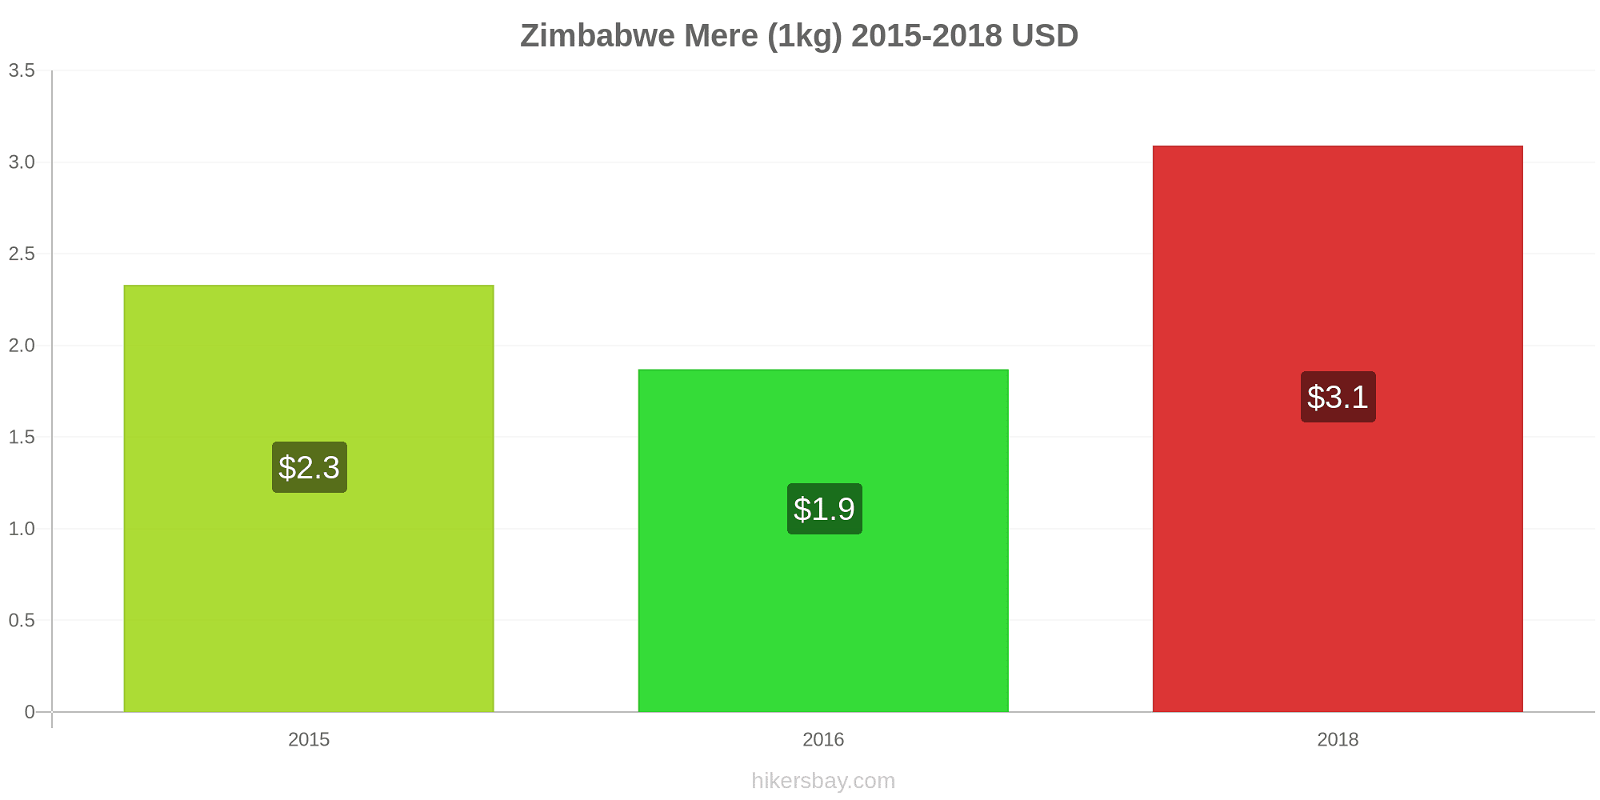 Zimbabwe modificări de preț Mere (1kg) hikersbay.com